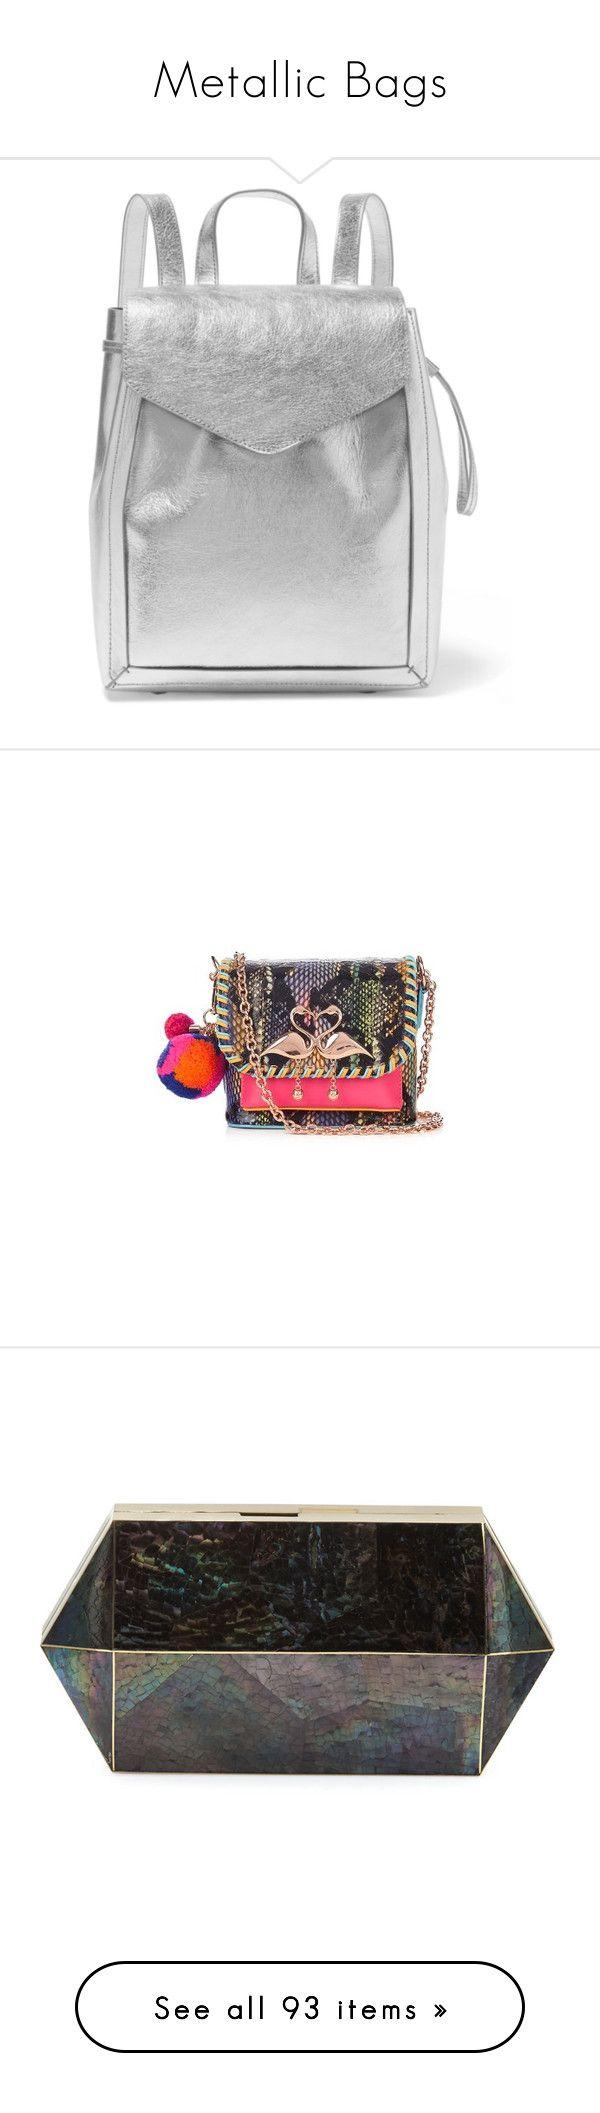 """Metallic Bags"" by nicefish ❤ liked on Polyvore featuring bags, backpacks, handbags, silver, zip bag, metallic bag, knapsack bag, loeffler randall bag, zipper bag and shoulder bags"